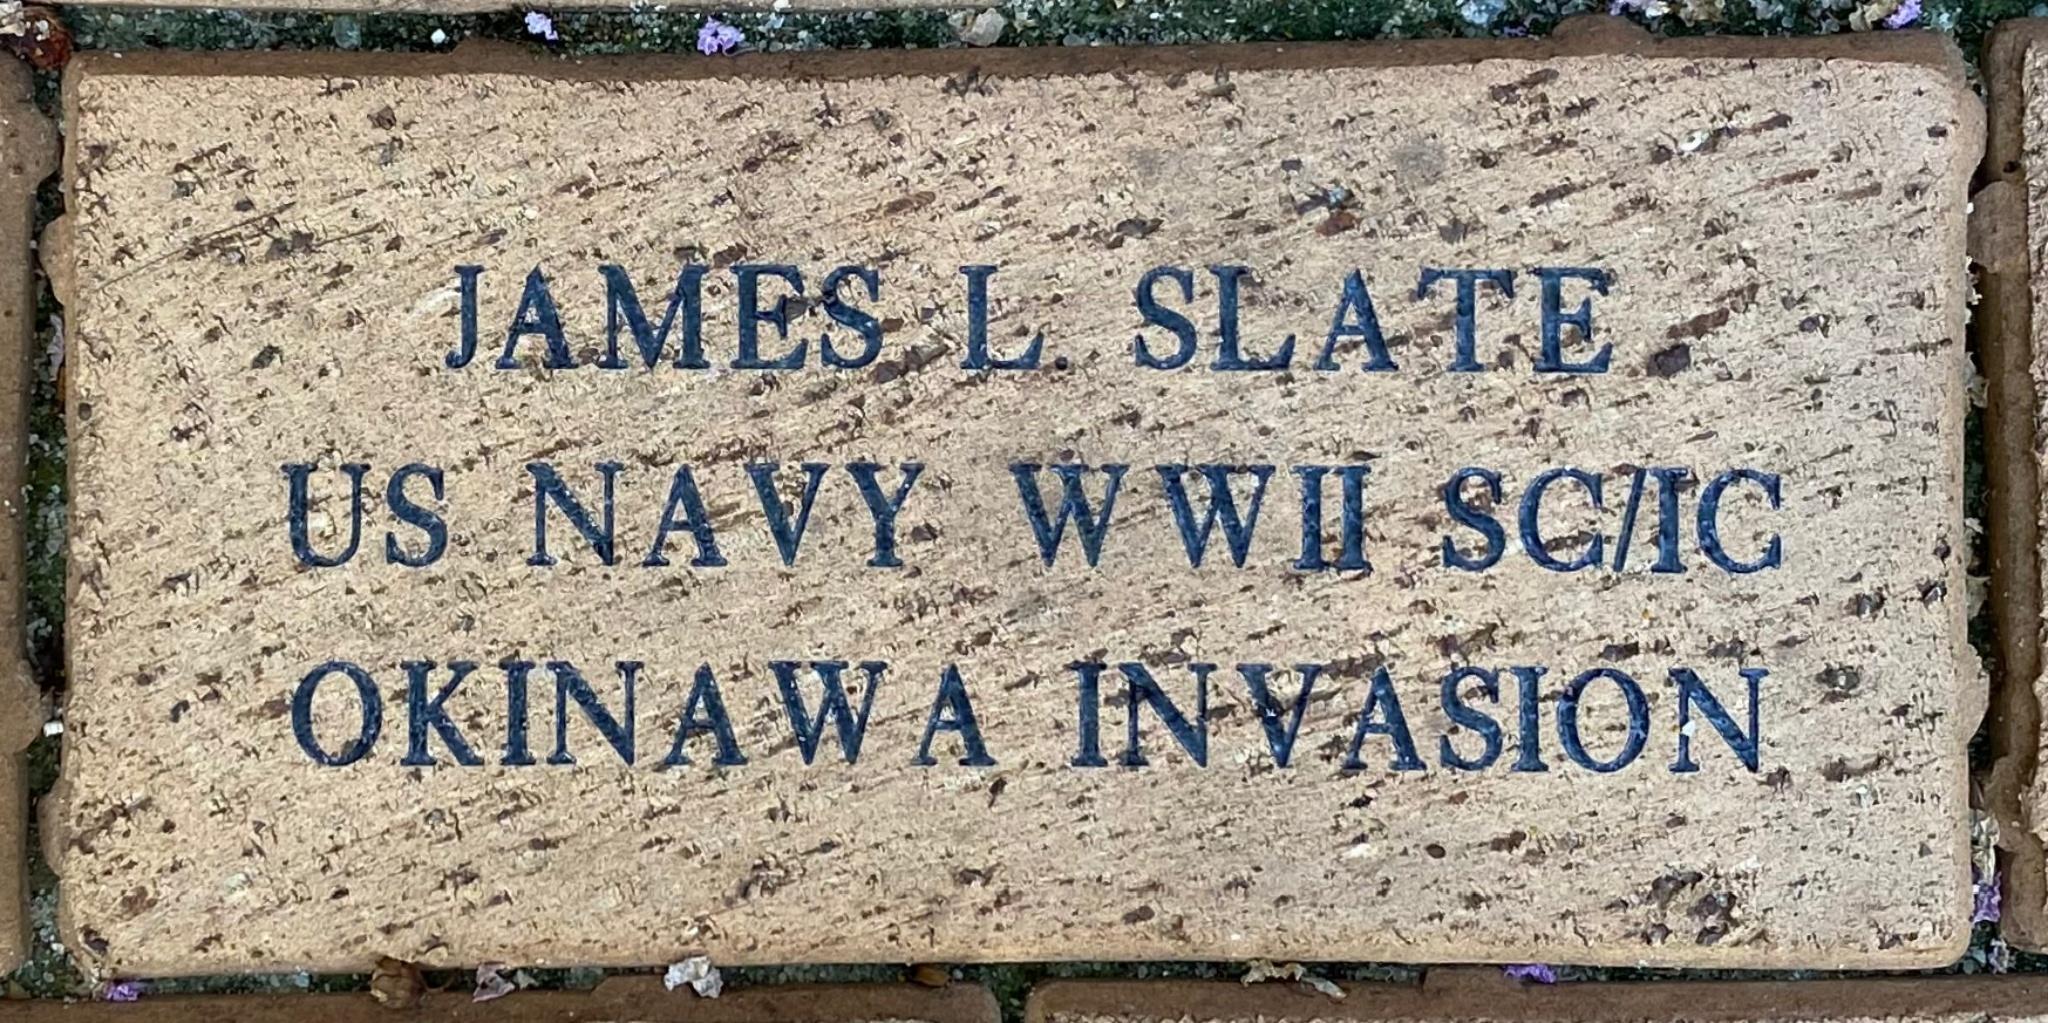 JAMES L. SLATE US NAVY WWII SC/IC OKINAWA INVASION